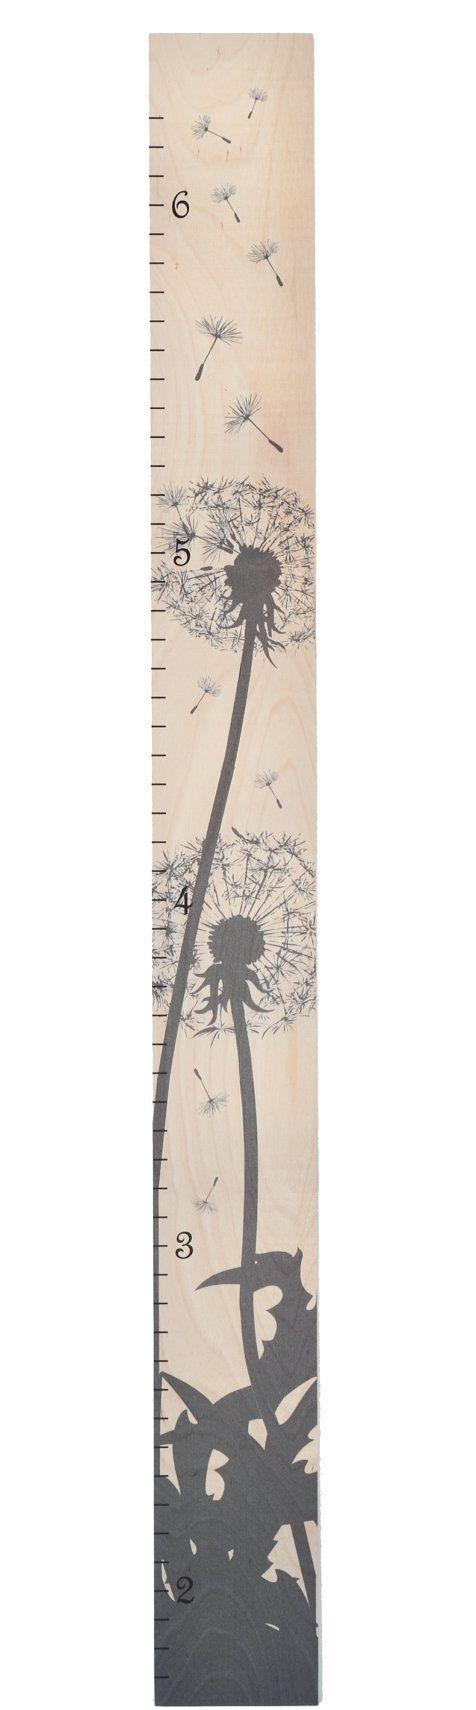 Dandelion Silhouette Modern Wooden Ruler Growth by GrowthChartArt